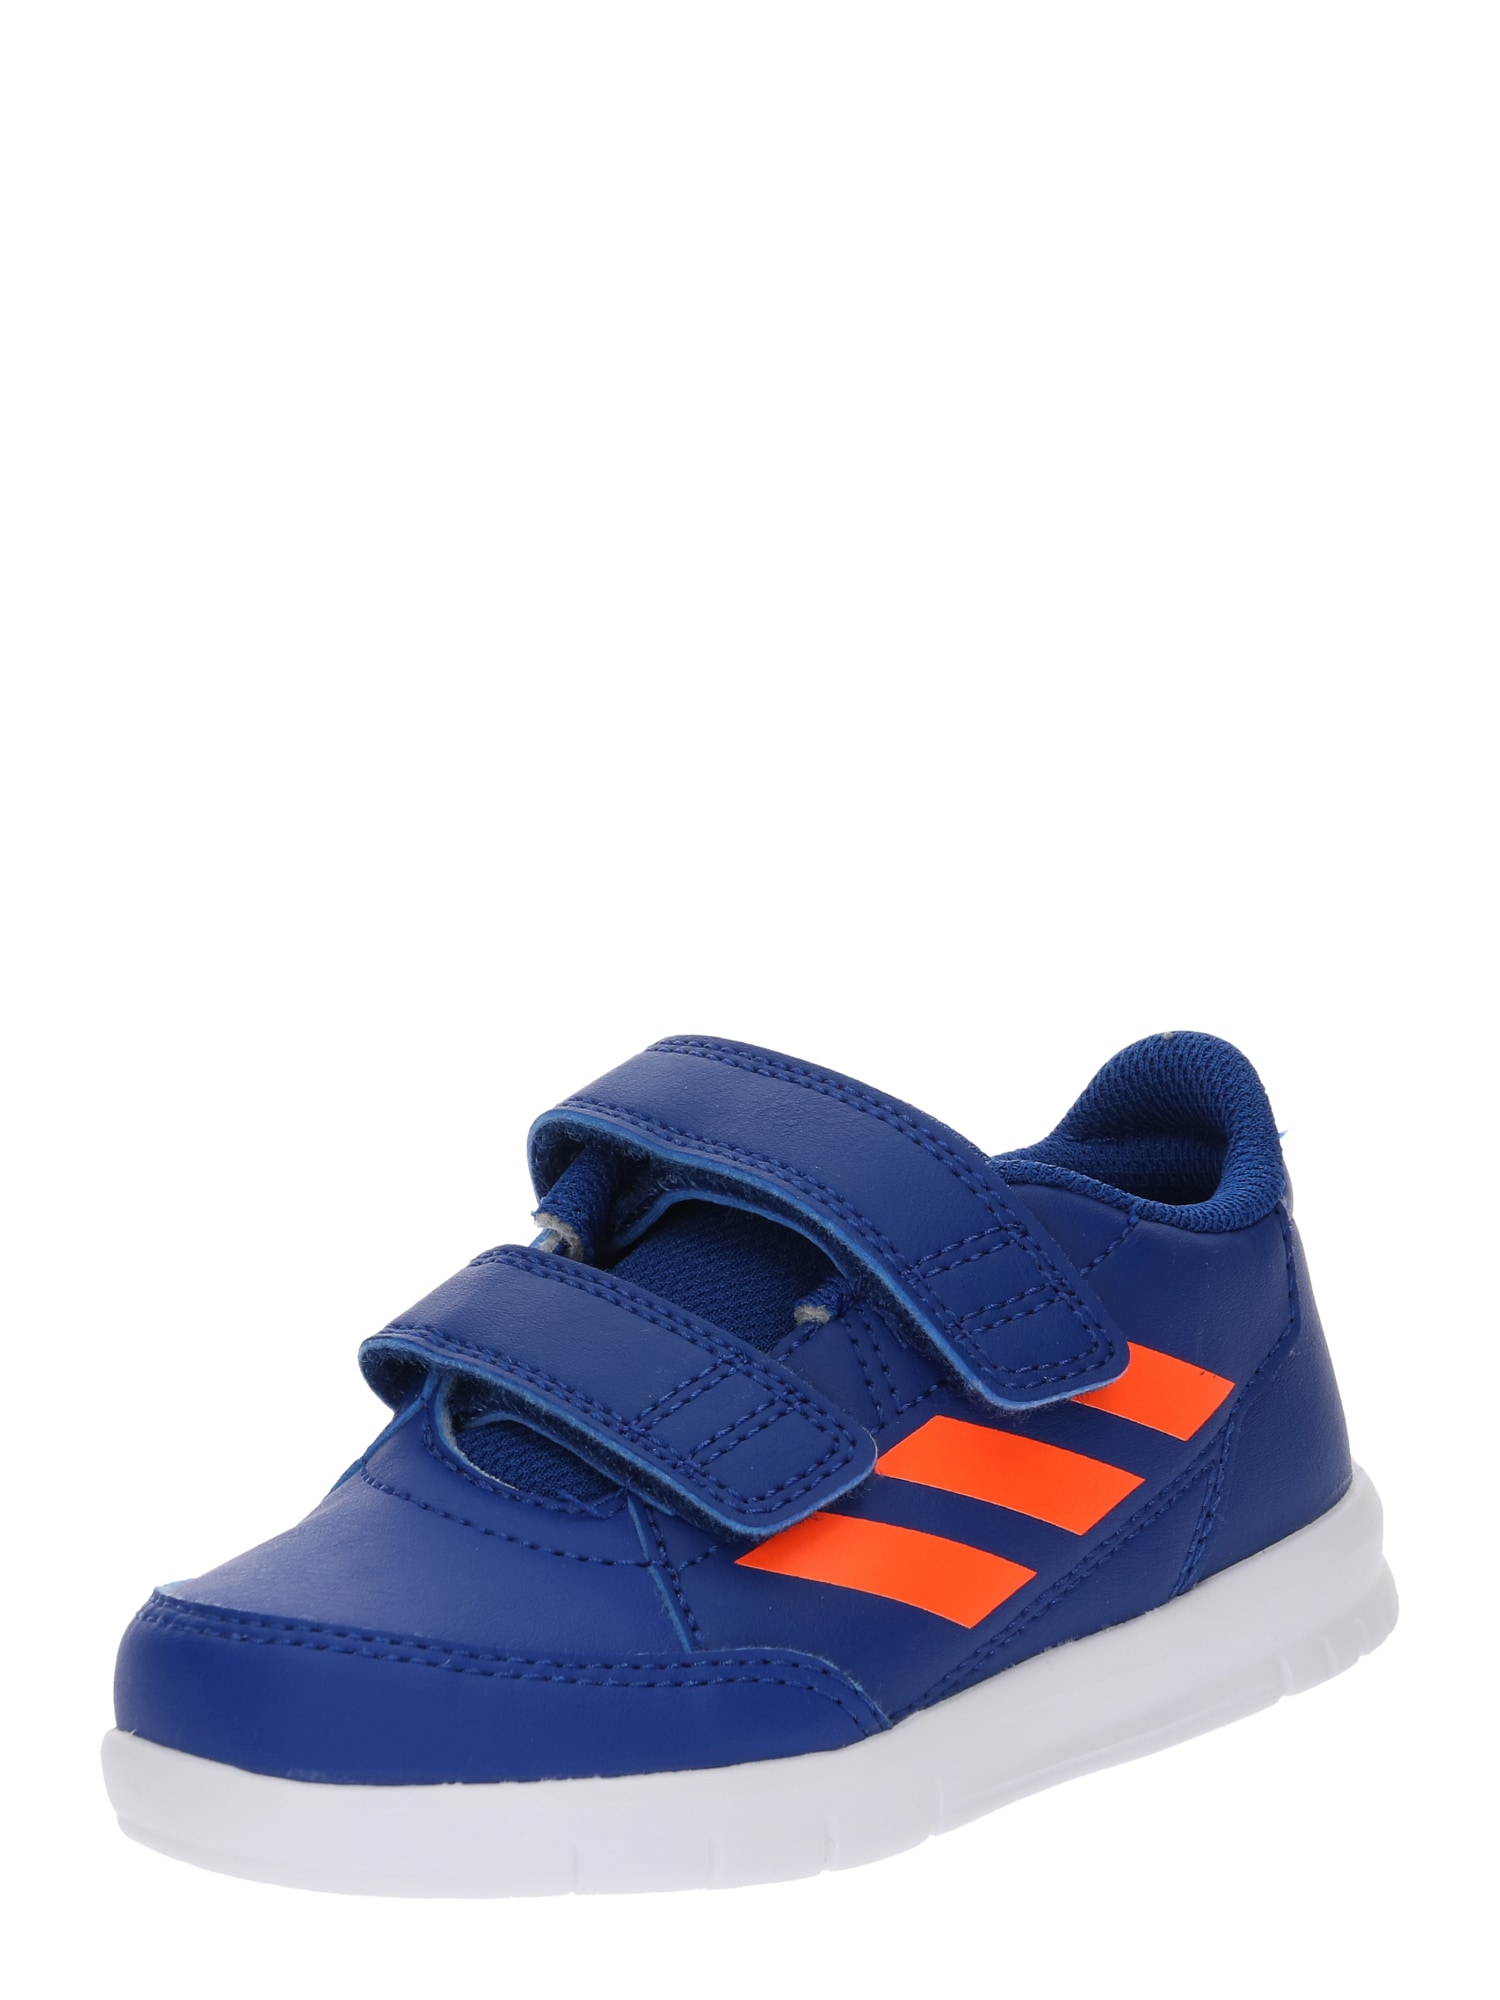 Sportovní boty AltaSport CF I modrá ADIDAS PERFORMANCE